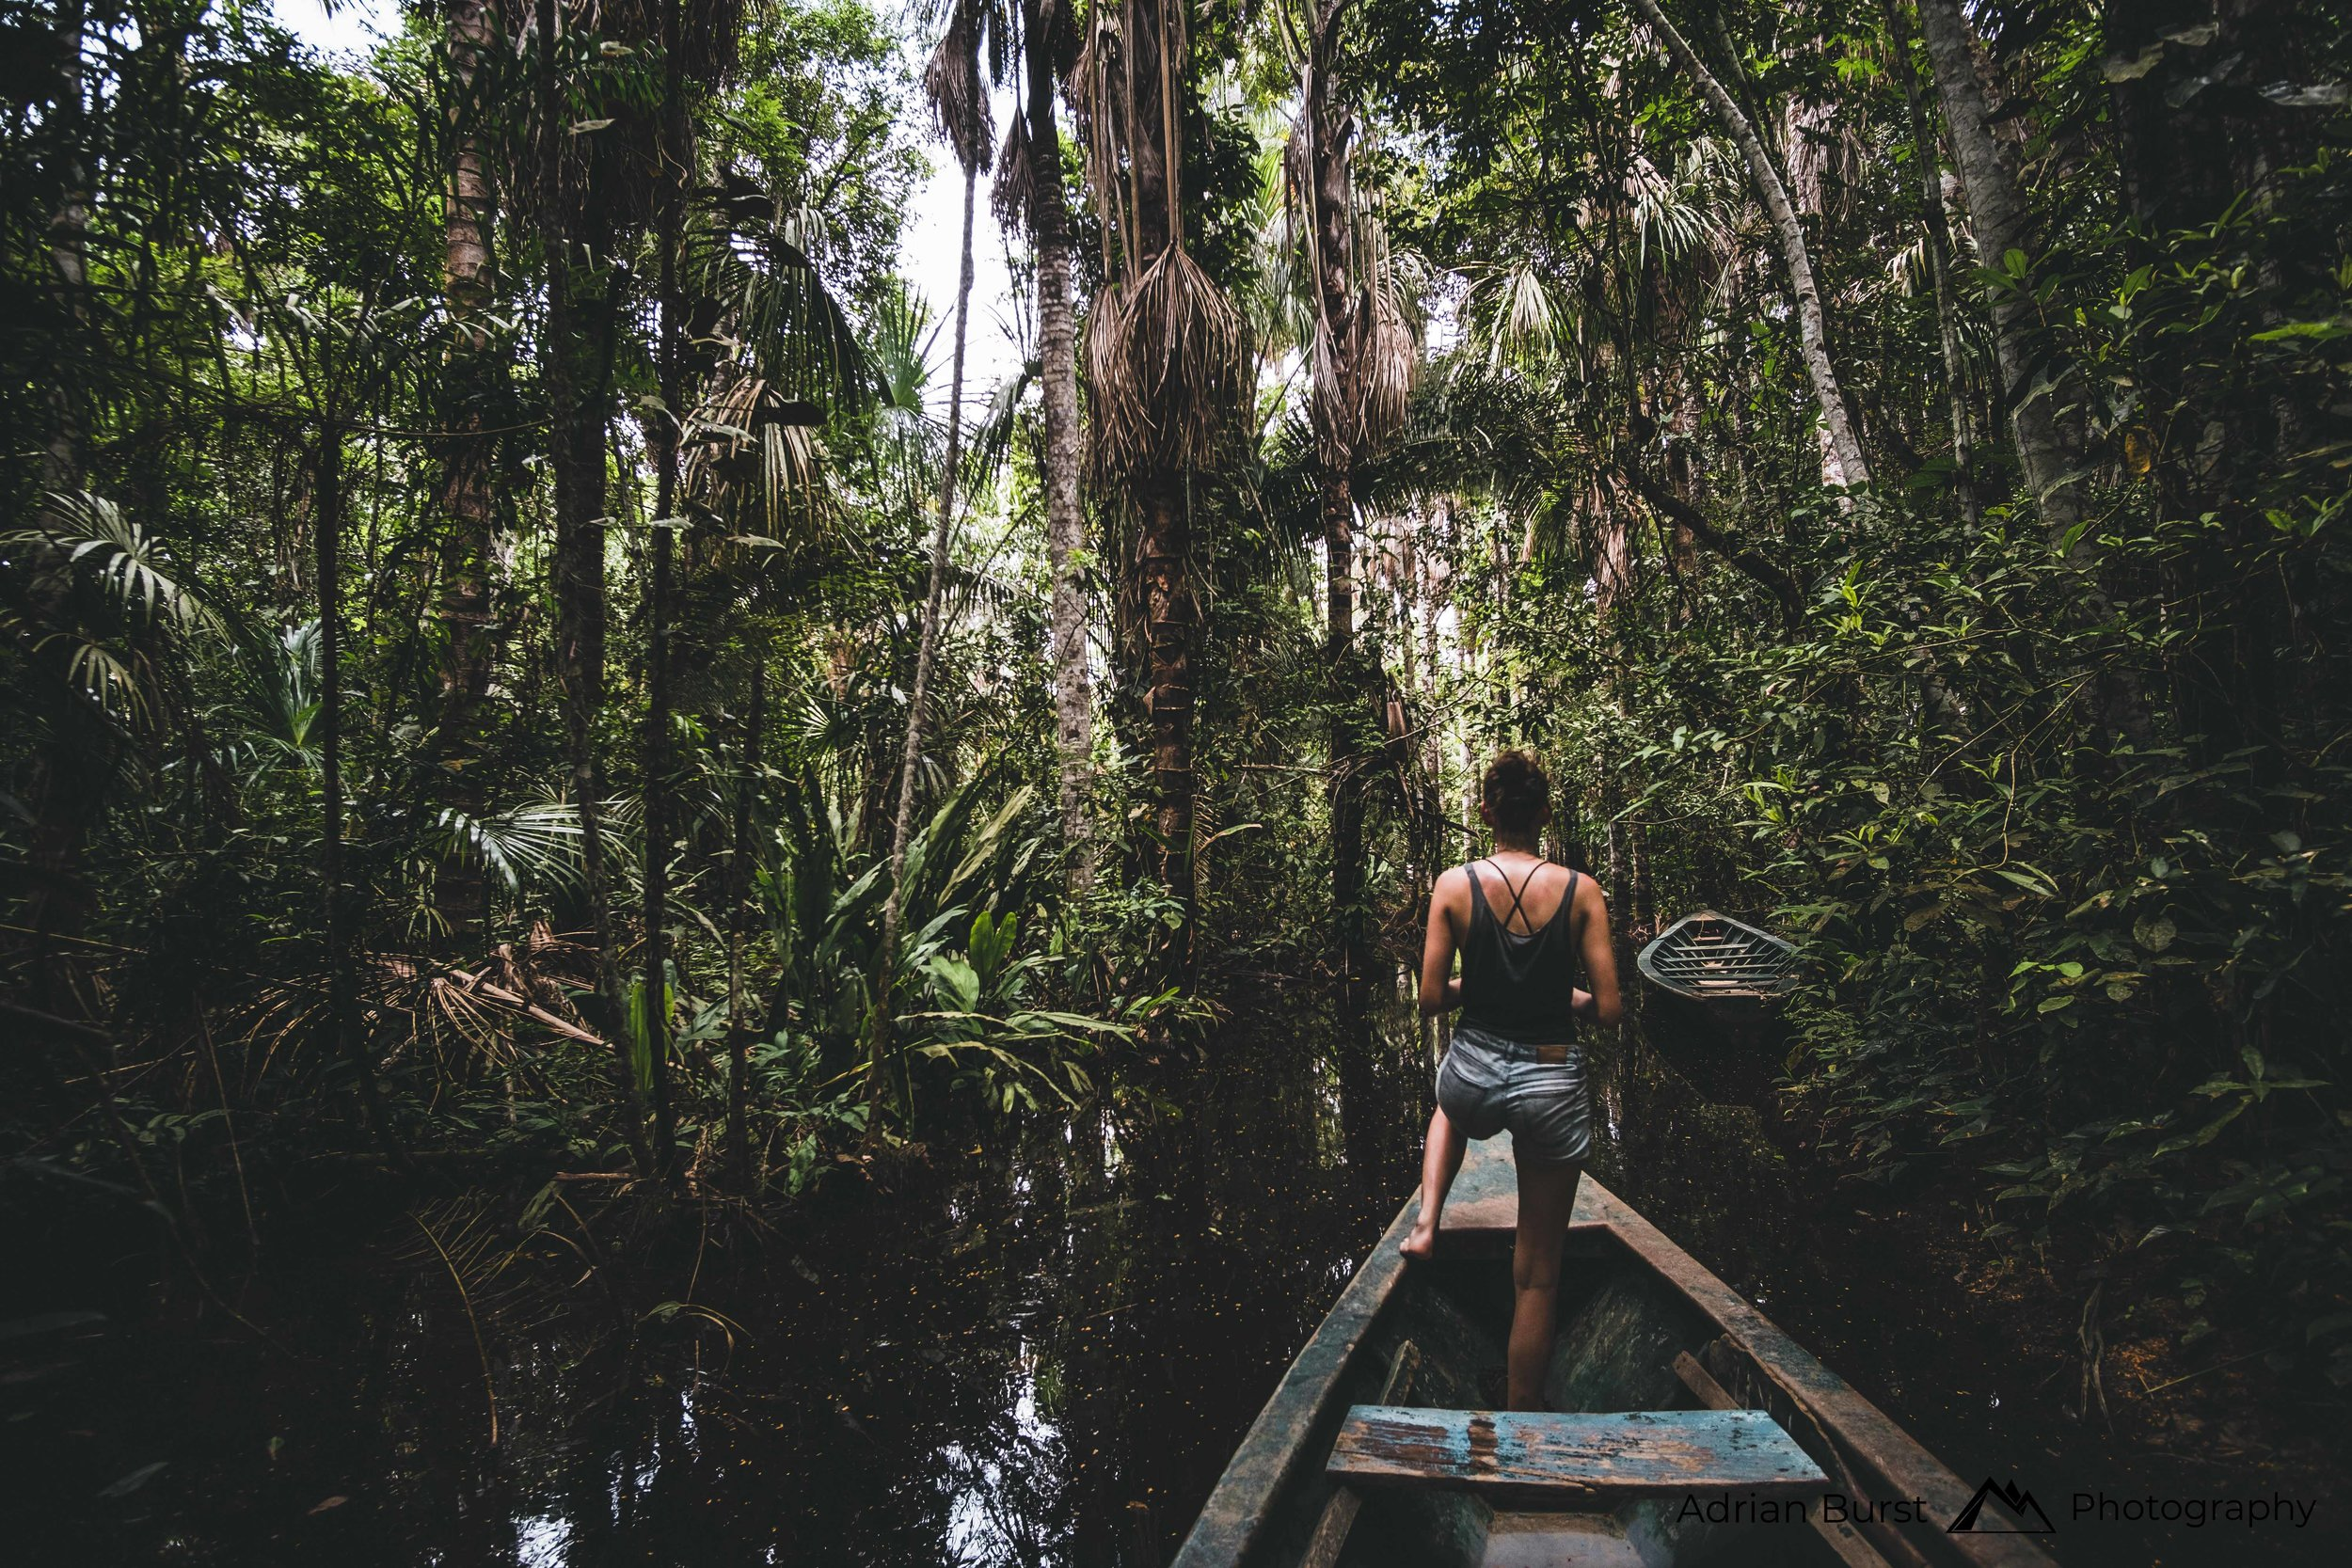 173 | Lake Sandoval, Tambopata national reserve